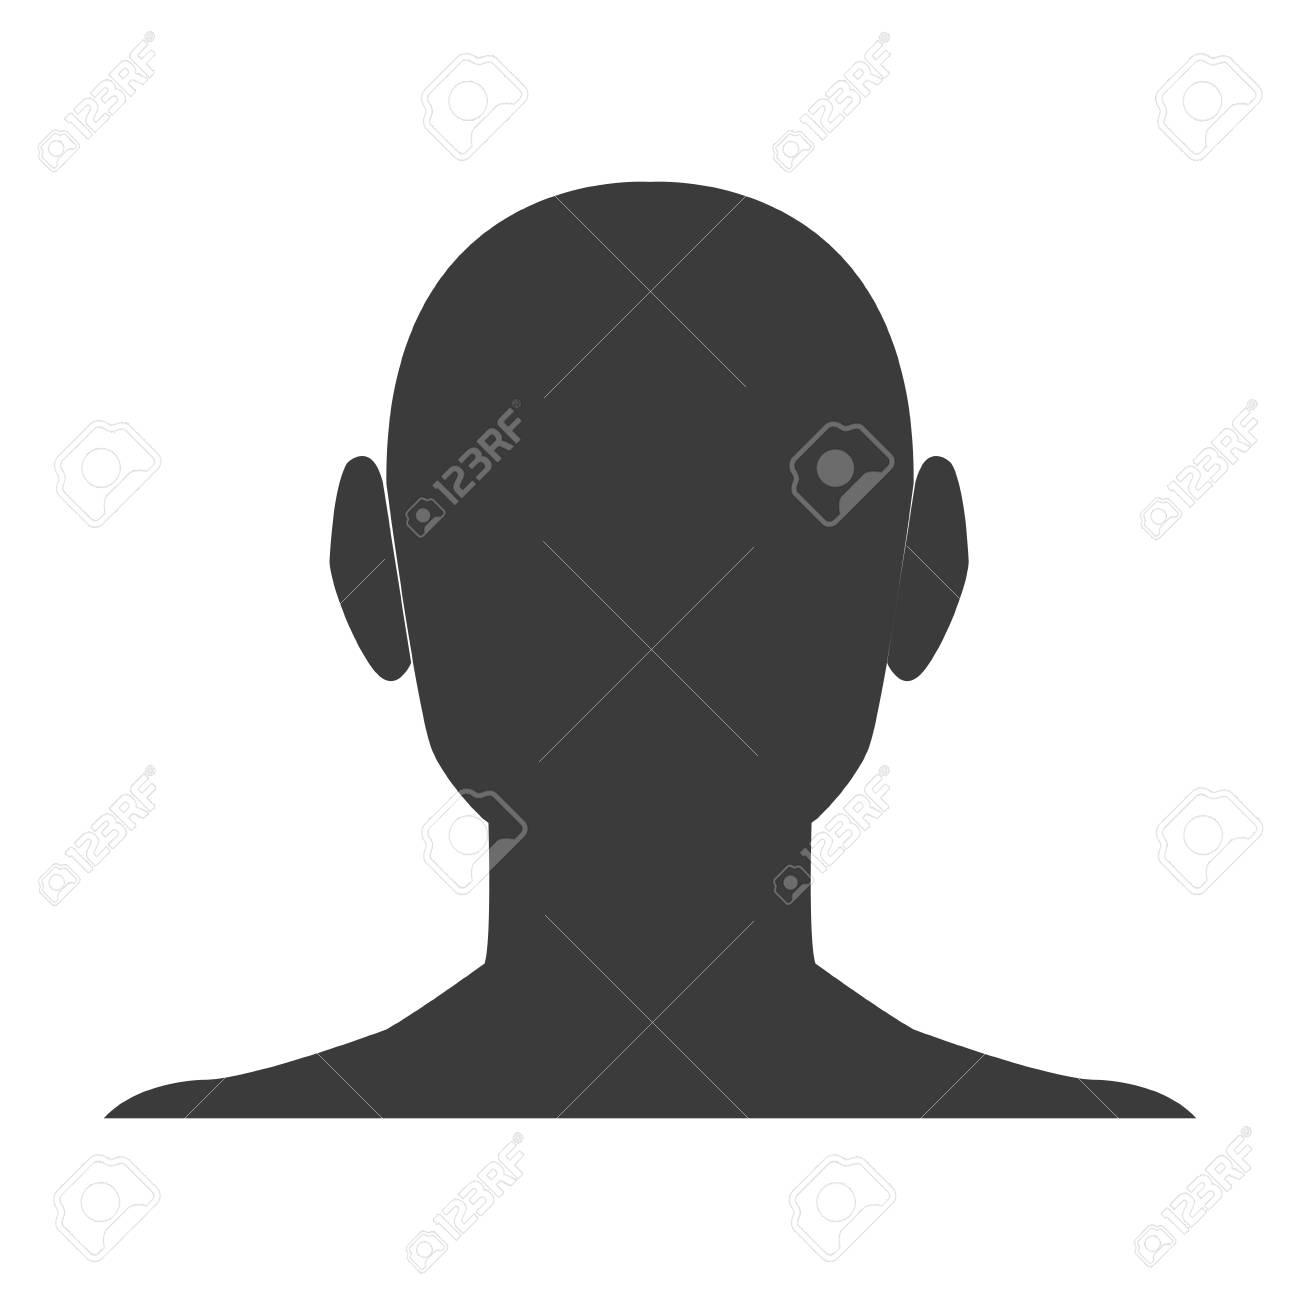 Silhouette head boy anime avatar image vector illustration stock vector 77853745